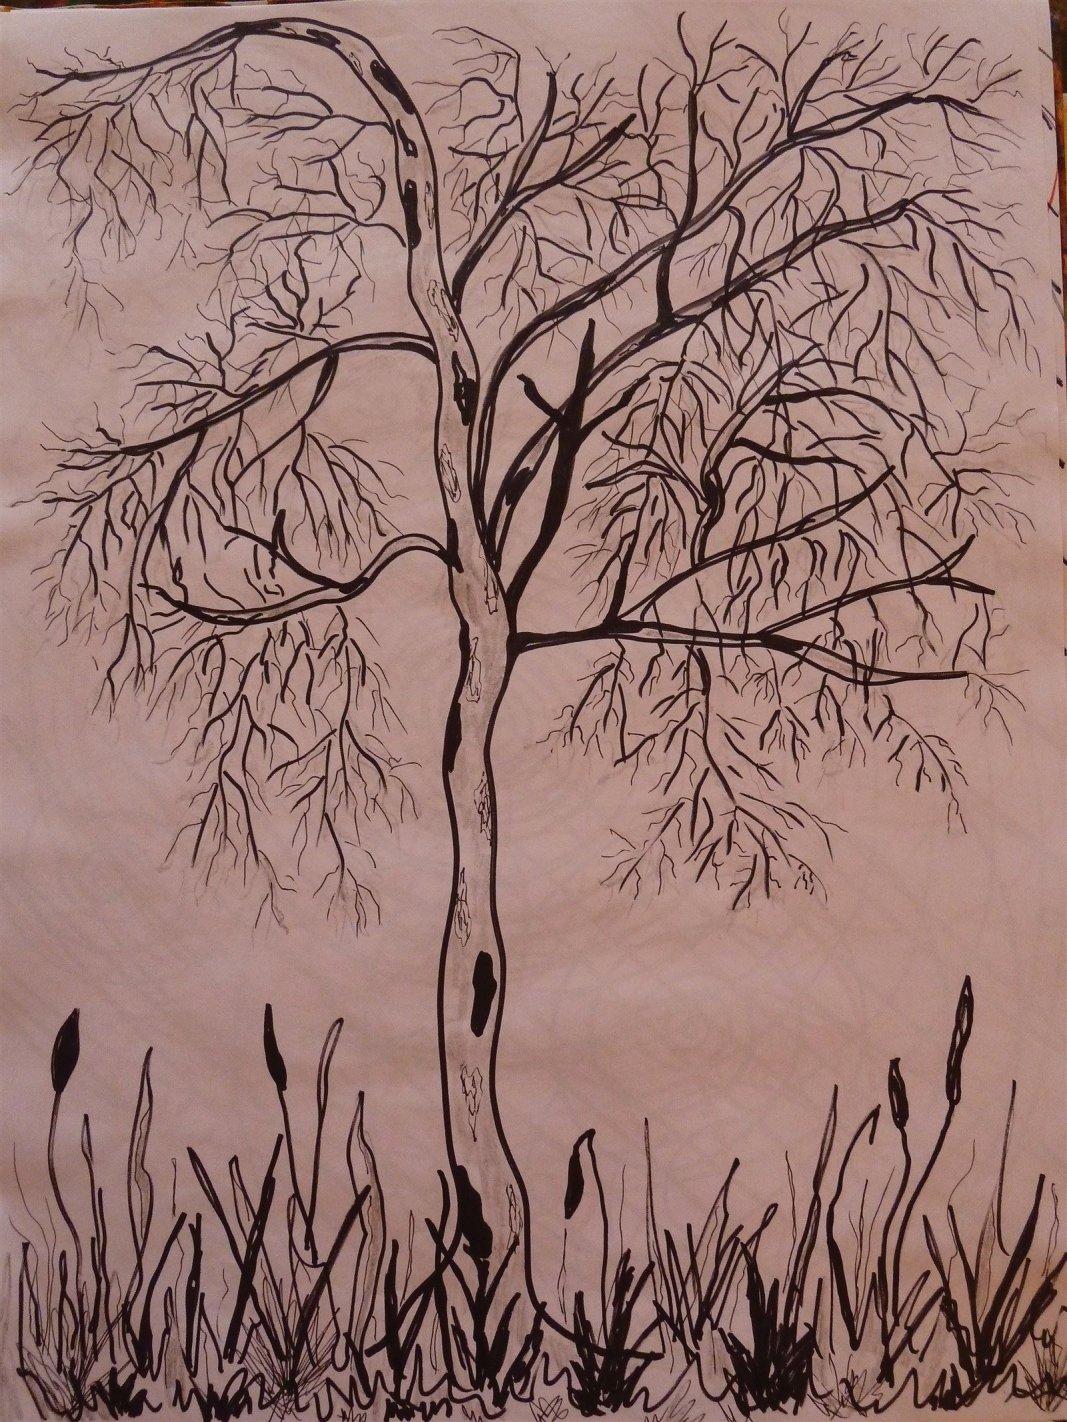 Baum-Symbol: Birke in der Kunsttherapie